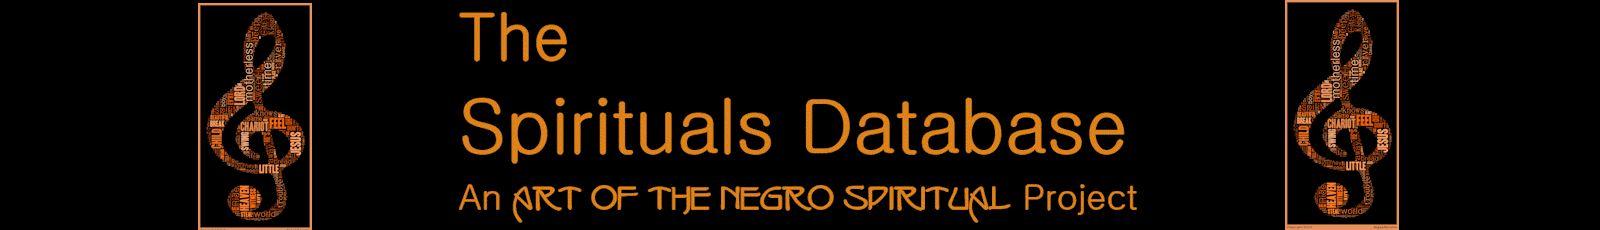 SpiritualDatabase